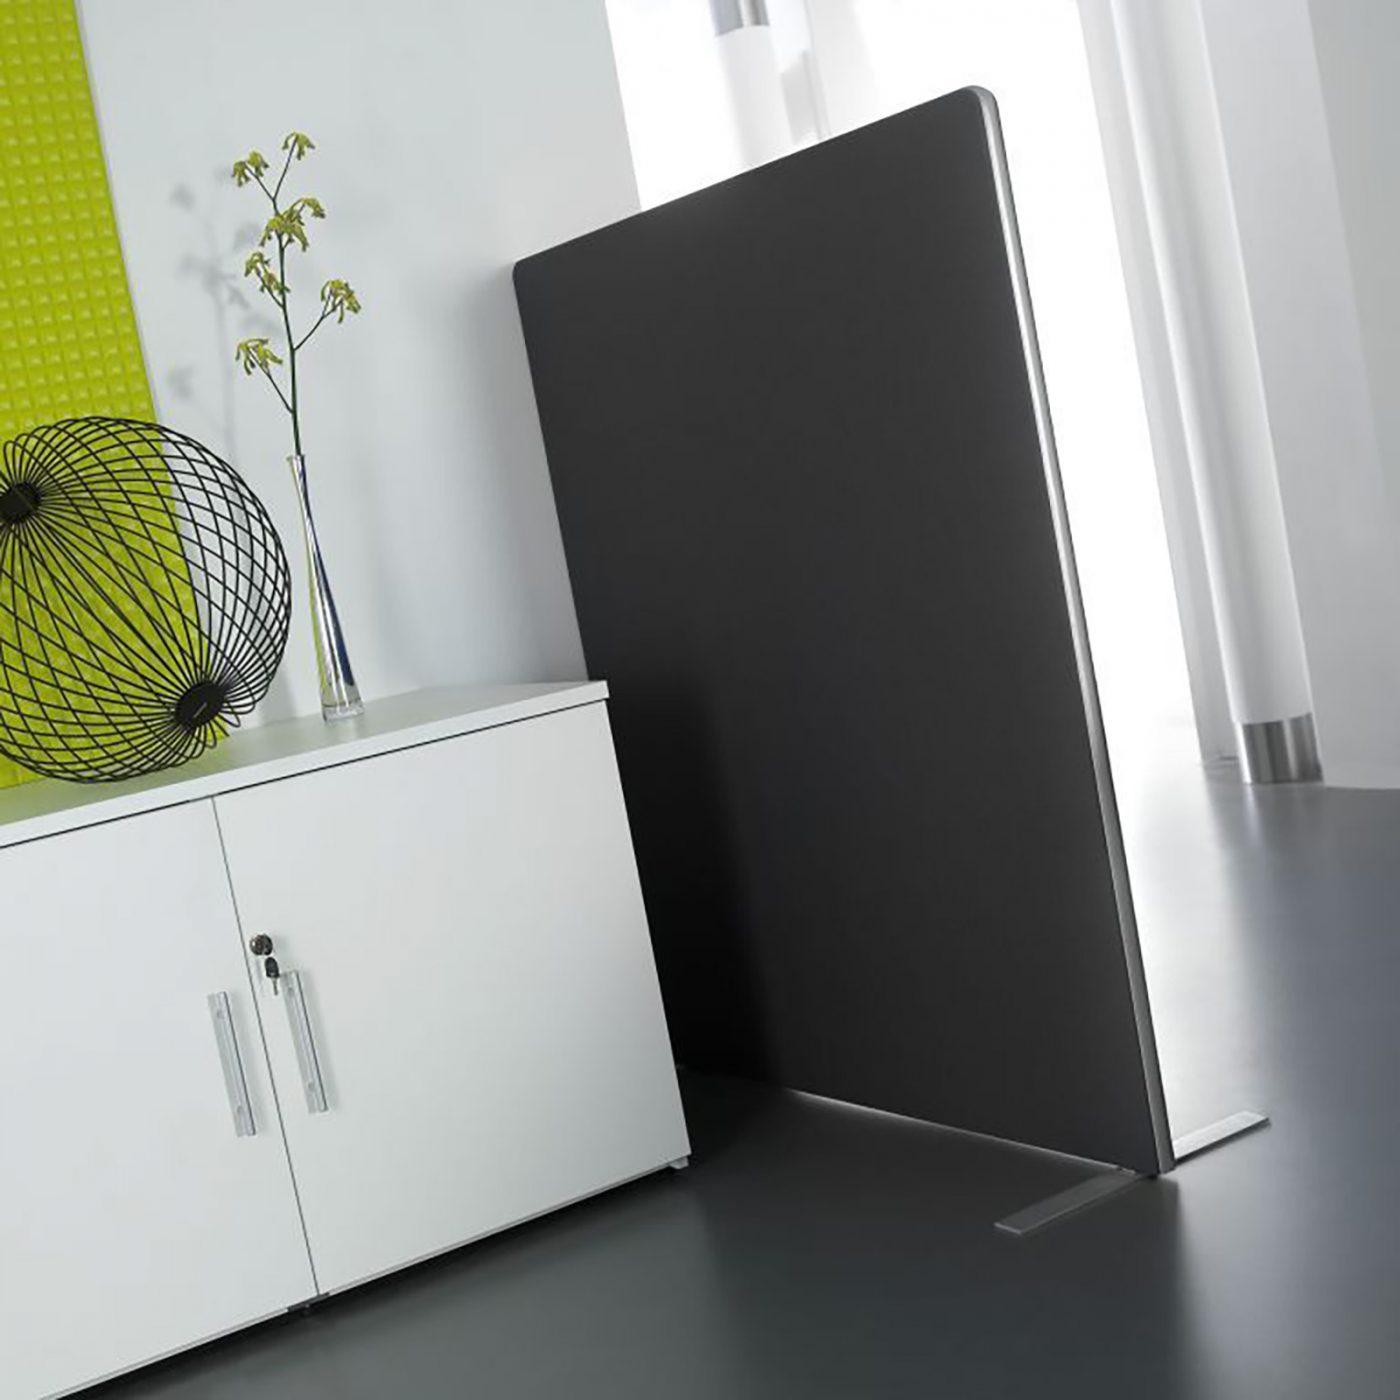 floor standing screen, tall screen, room divider, fabric screen, black fabric screen, silver edged screen